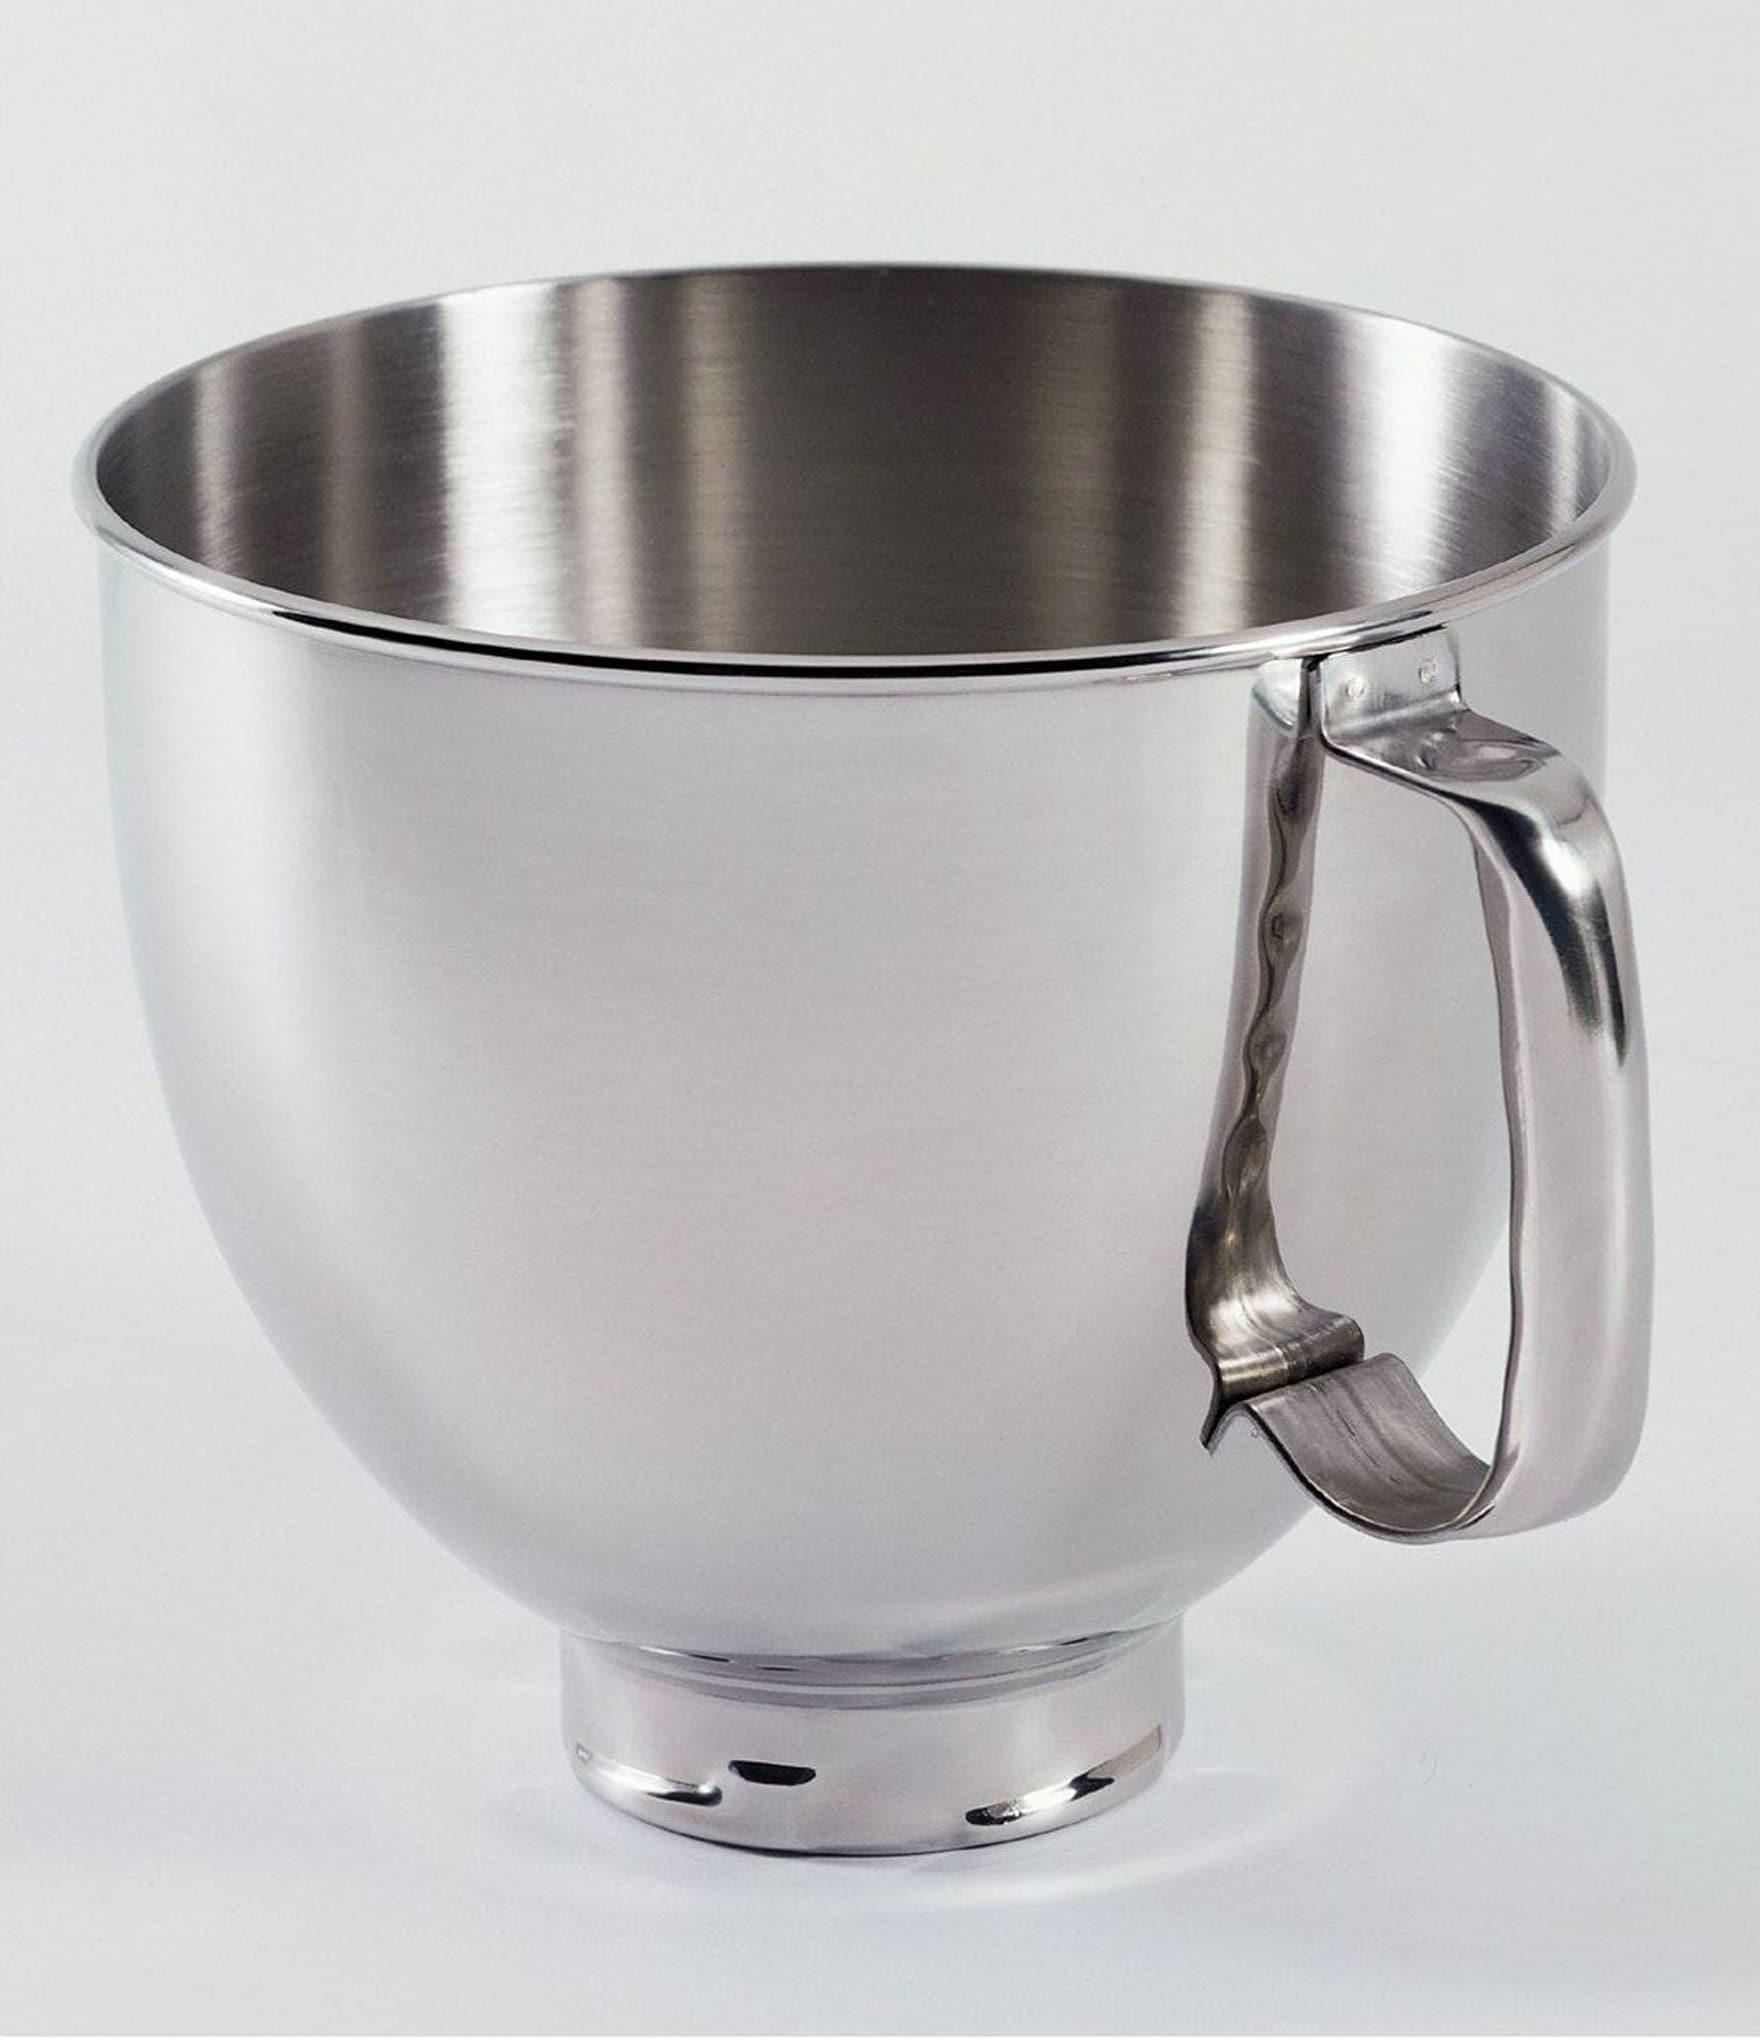 Kitchenaid Glass Mixing Bowl